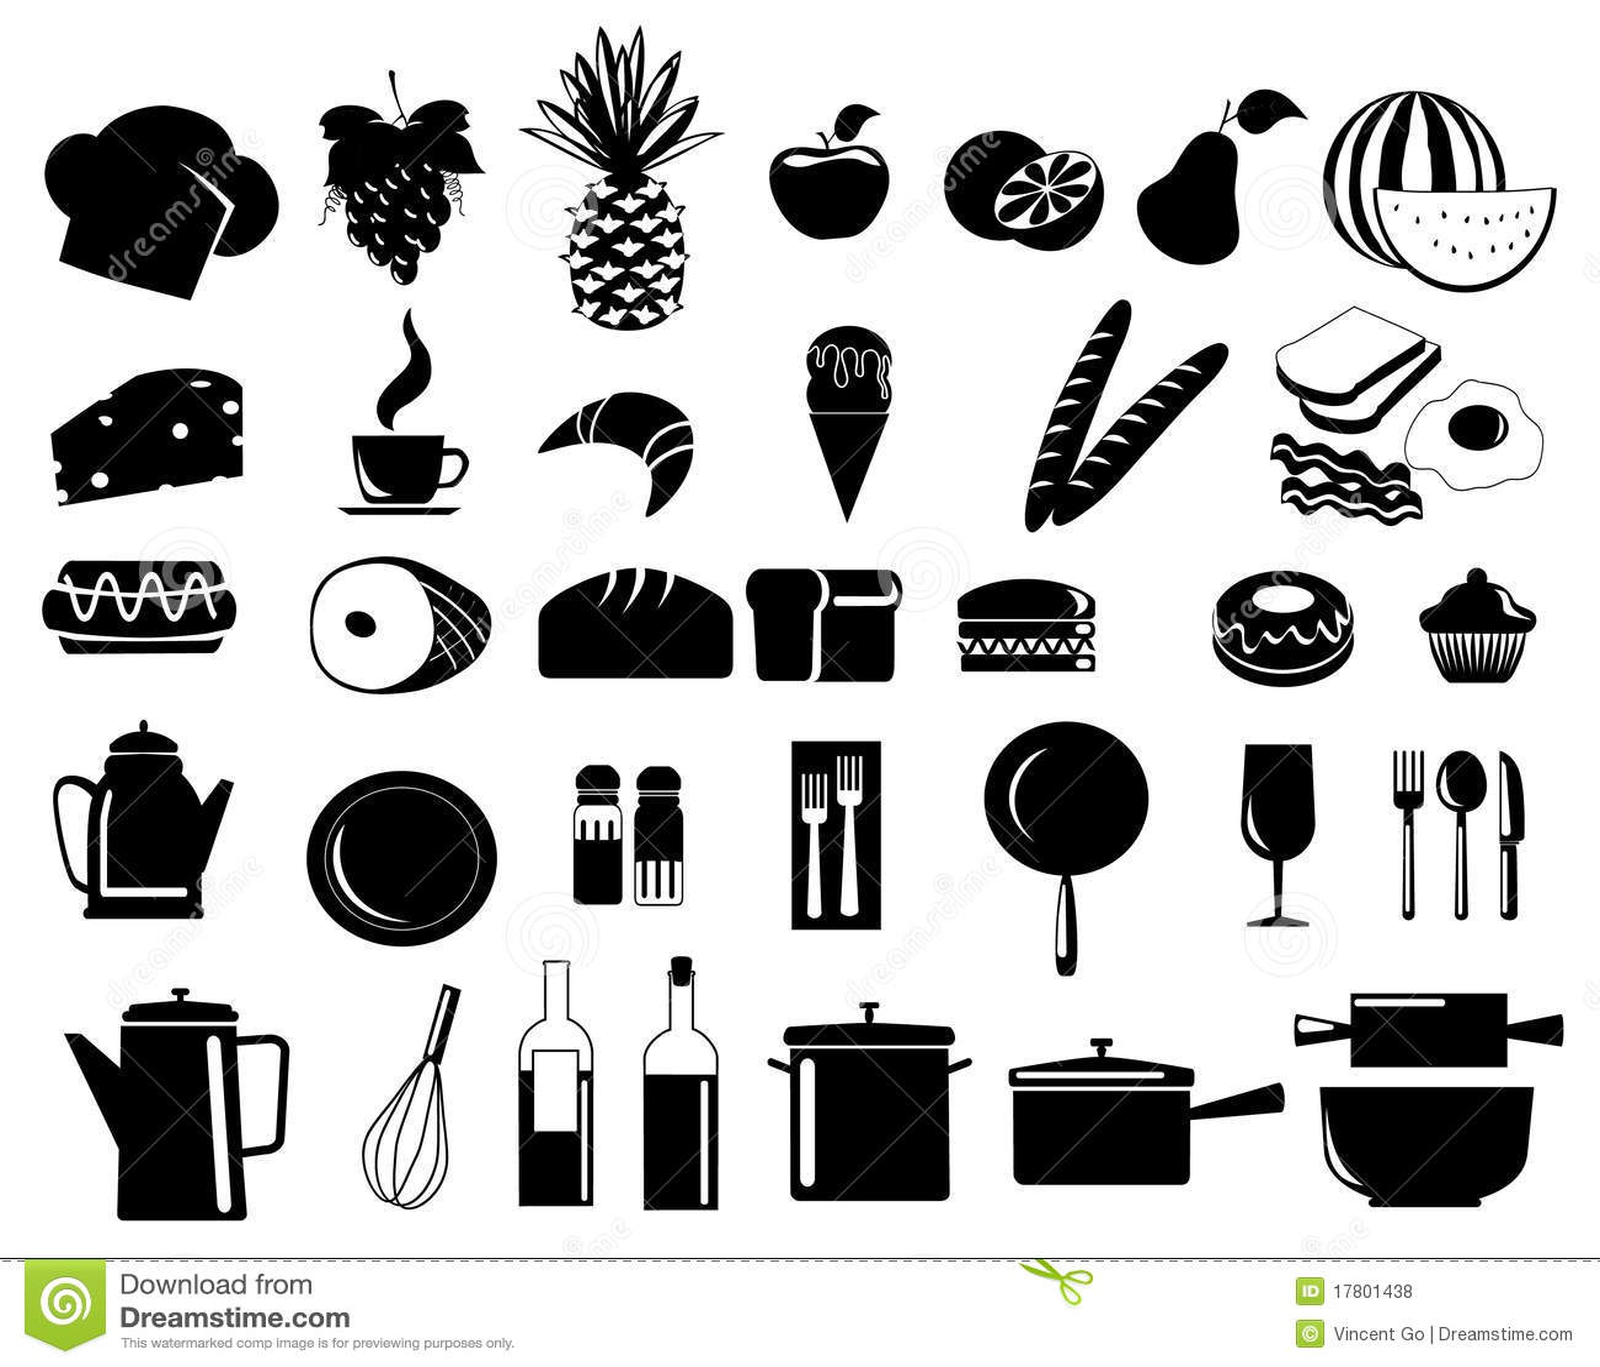 Moen T6420bn Parts List And Diagram Ereplacementpartscom